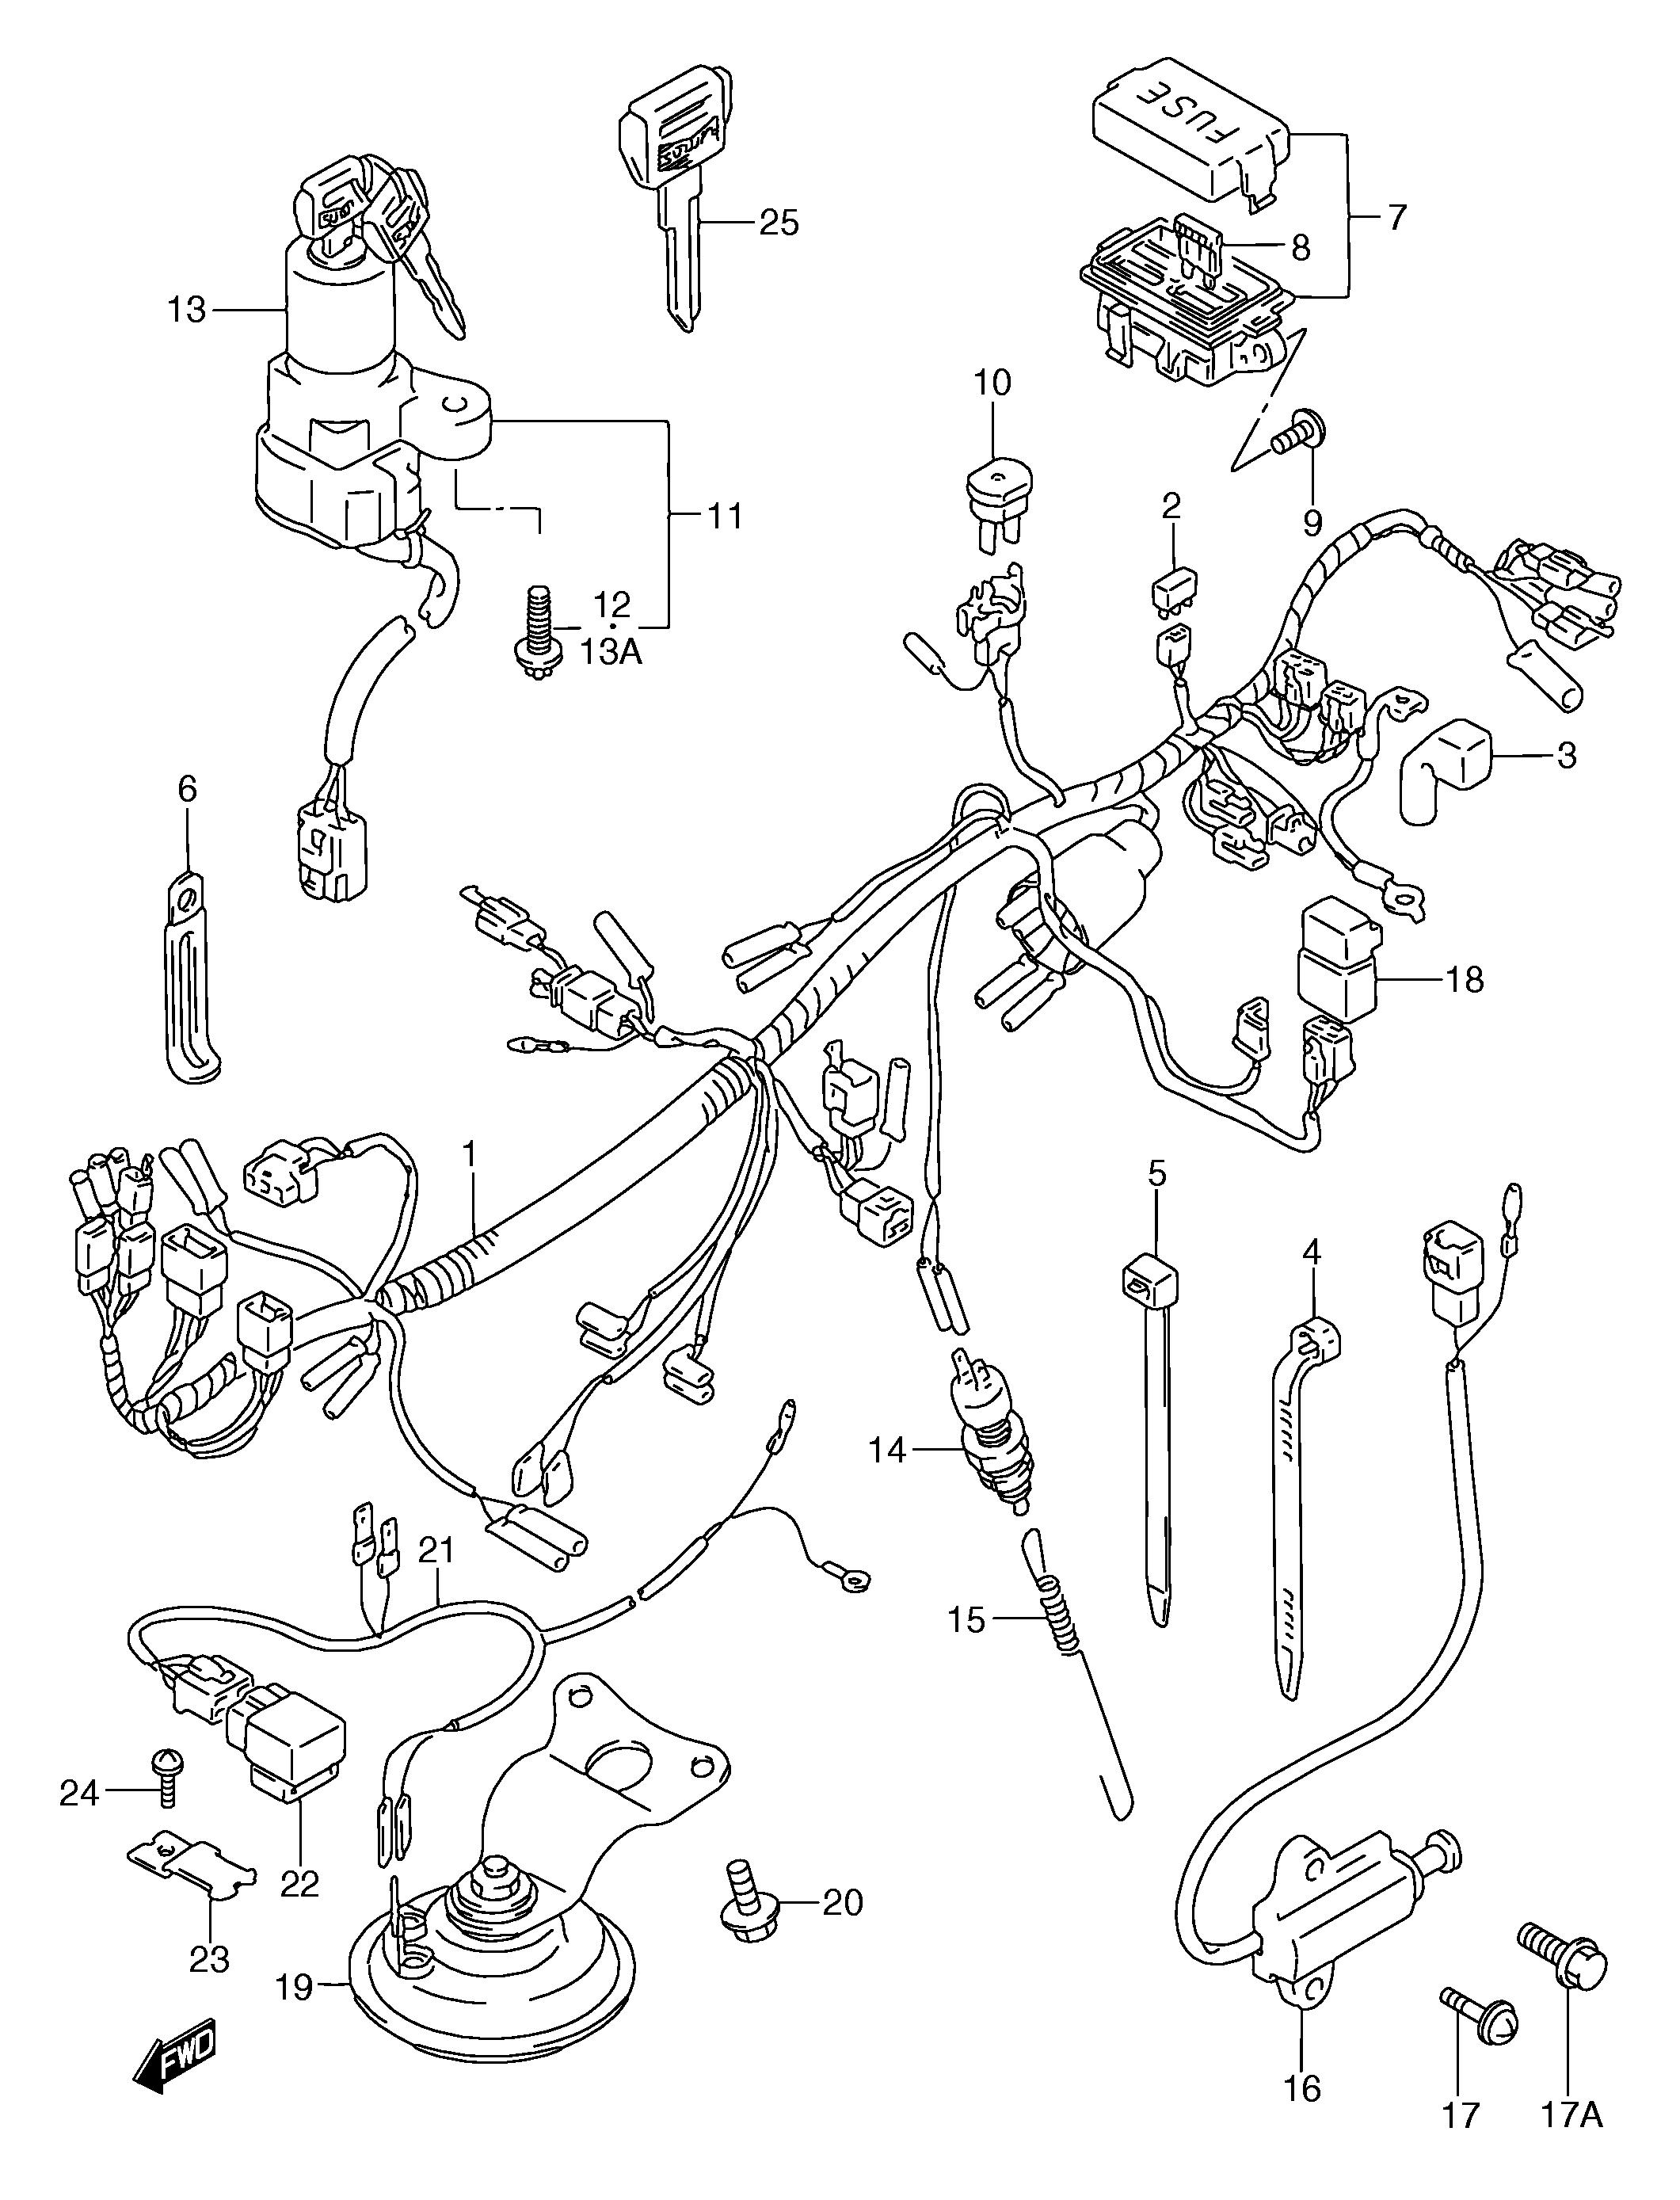 Interruptor pata de cabra Suzuki Gsx f 750 1989-1997